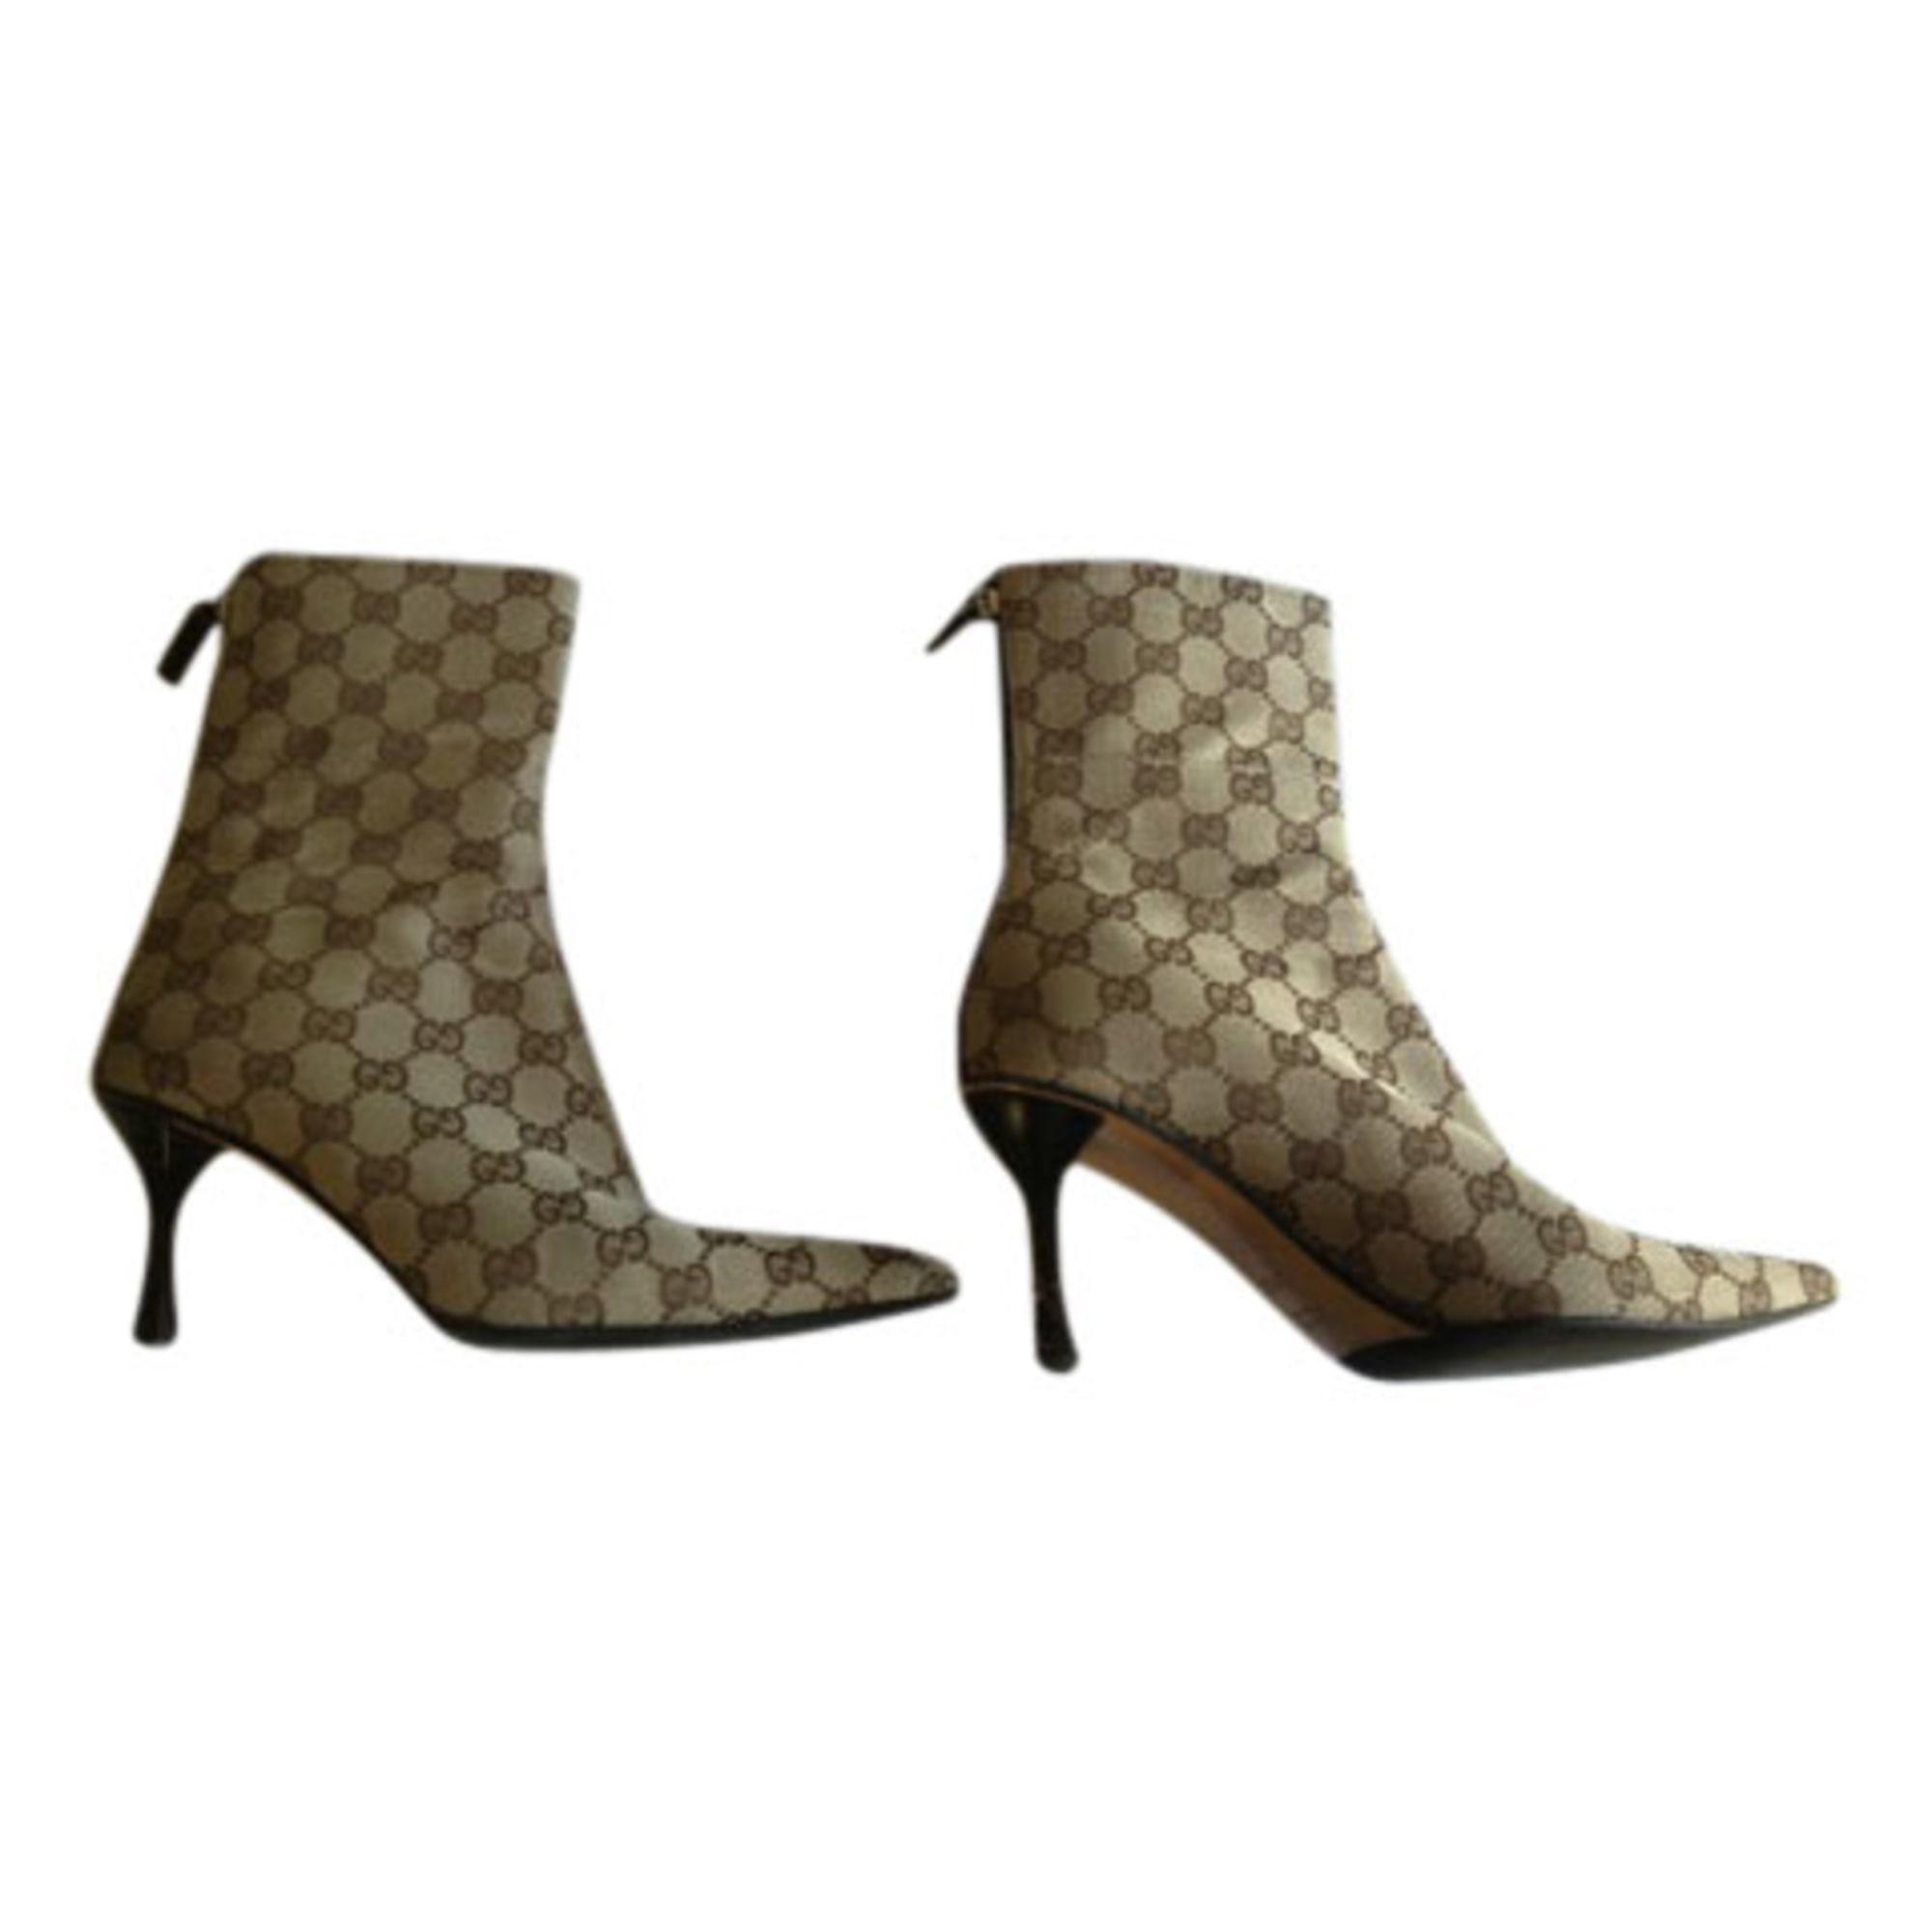 talons à Bottineslow boots talons à Bottineslow boots RLj45A